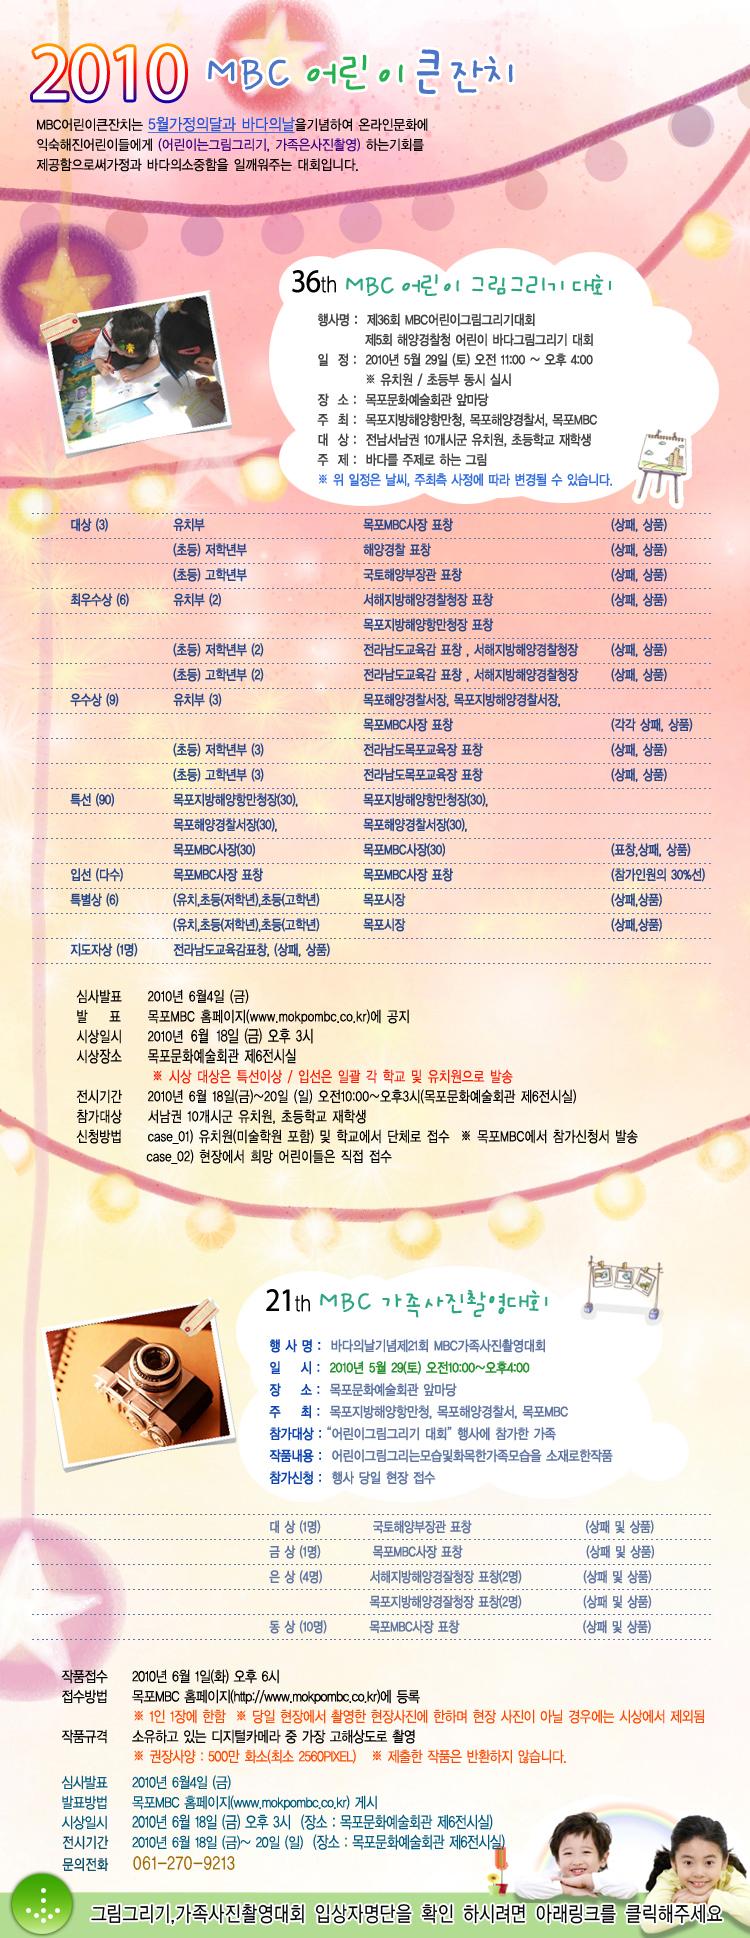 2010 MBC 가족사진 촬영대회 행사정보